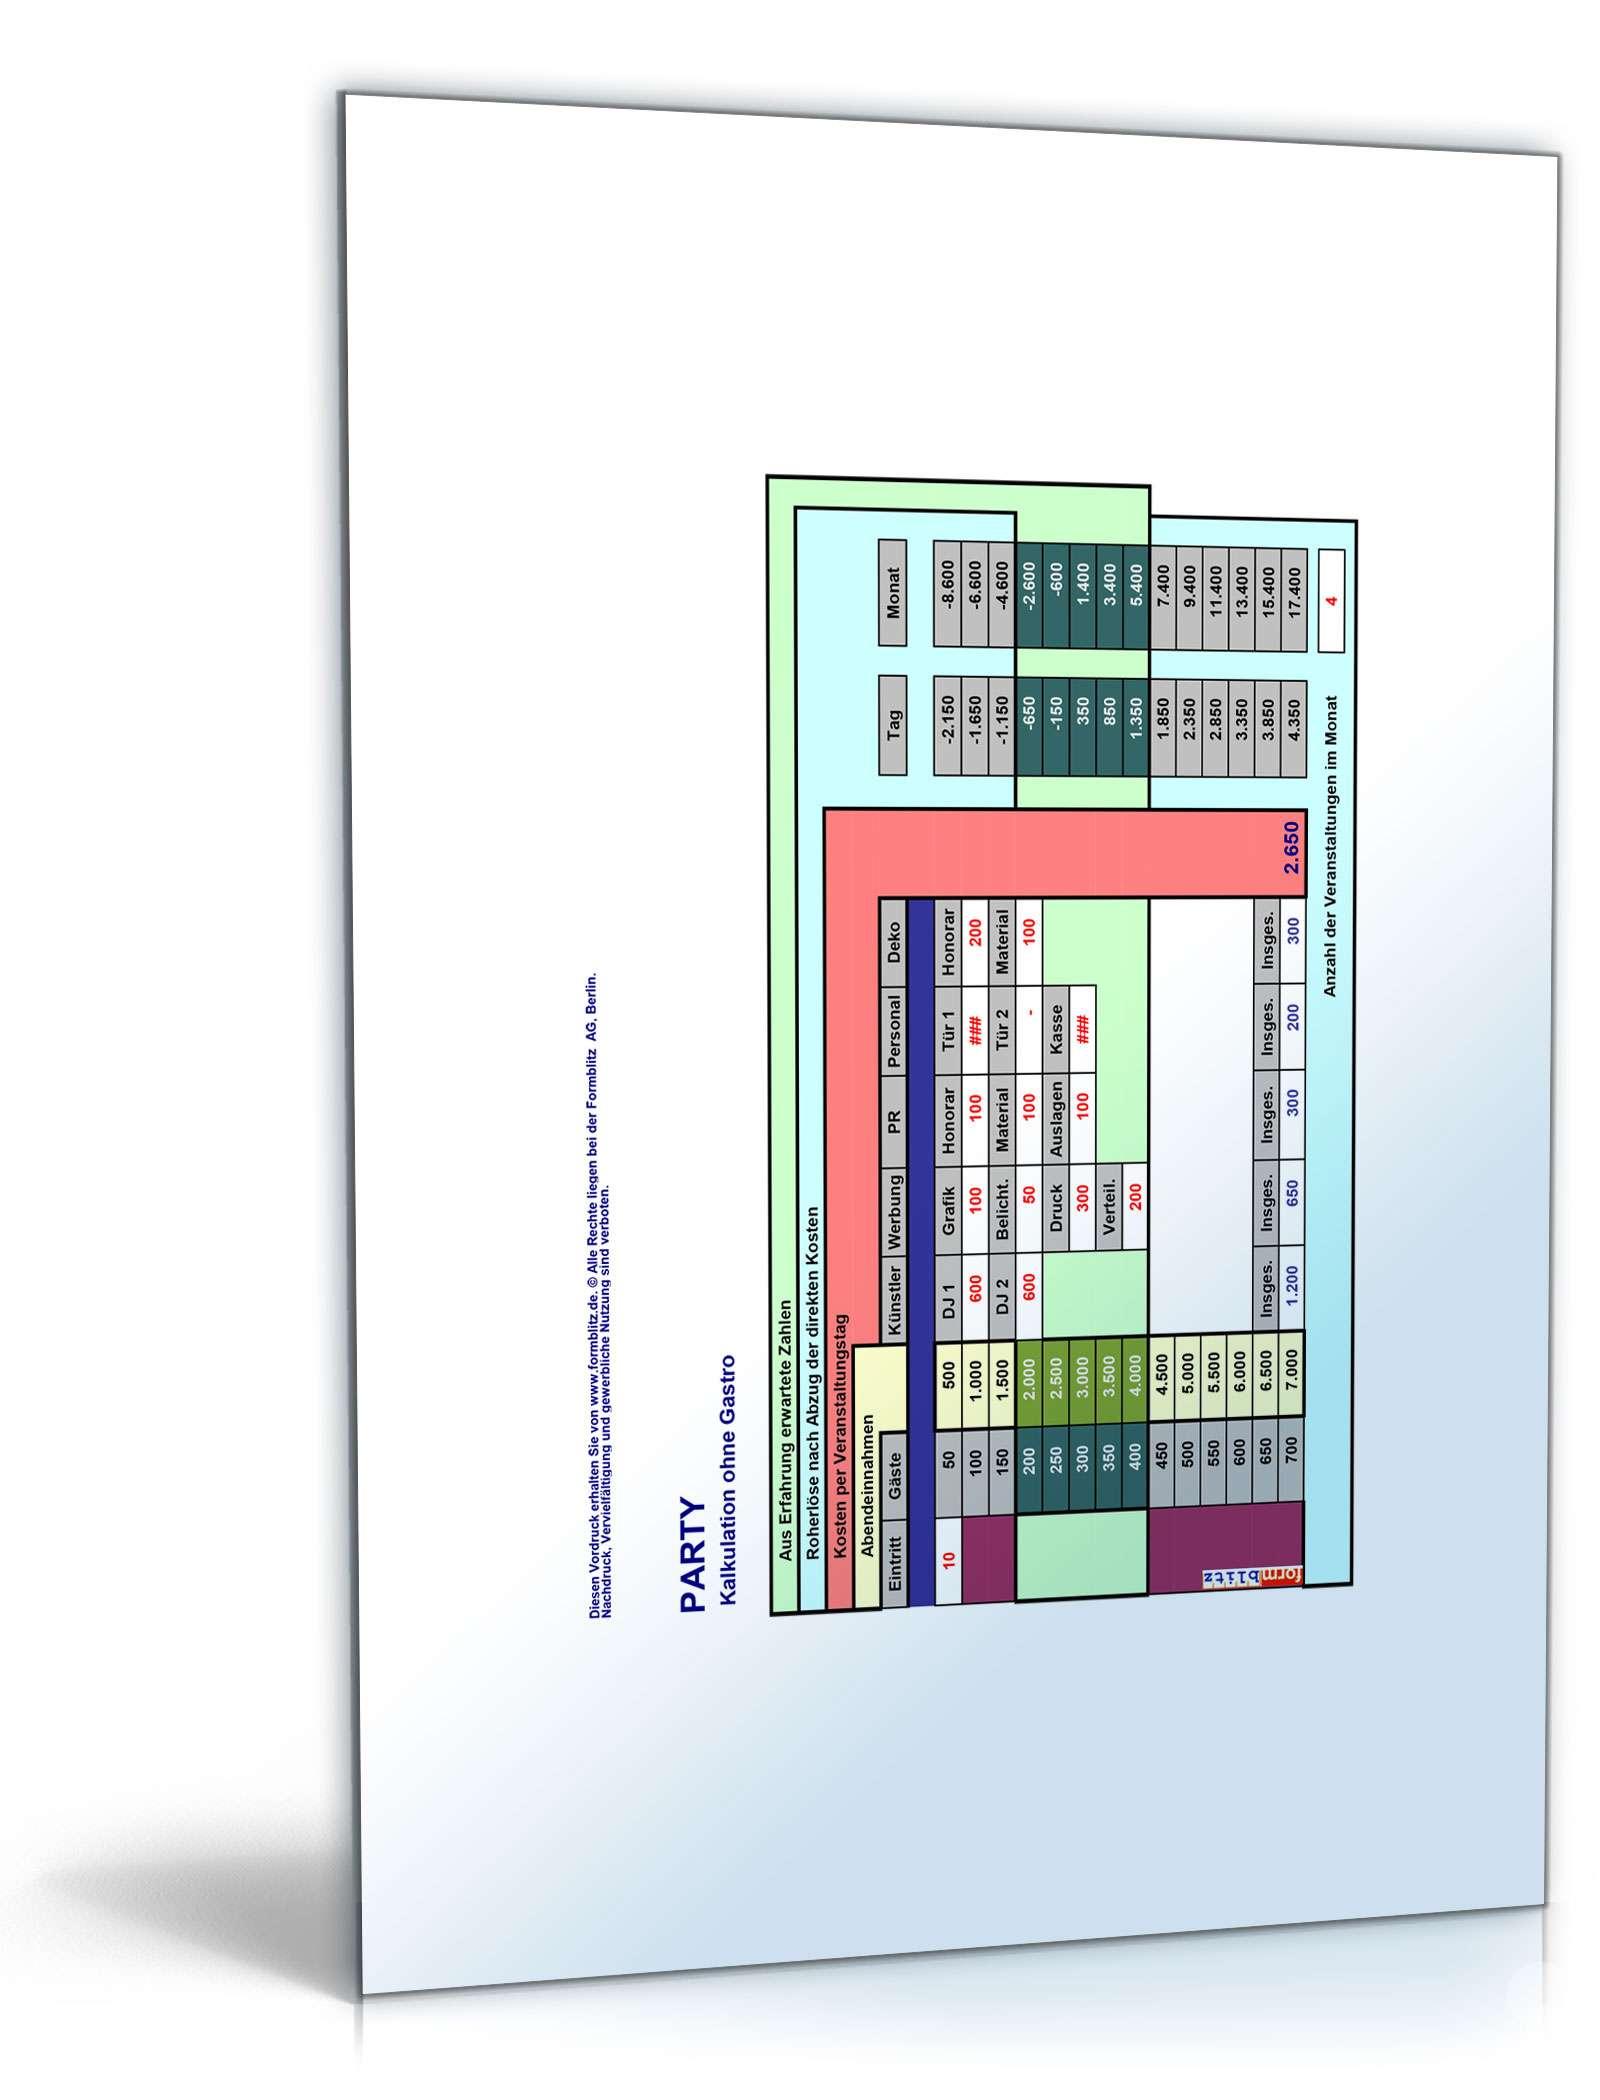 kalkulation veranstaltung vorlage zum download. Black Bedroom Furniture Sets. Home Design Ideas